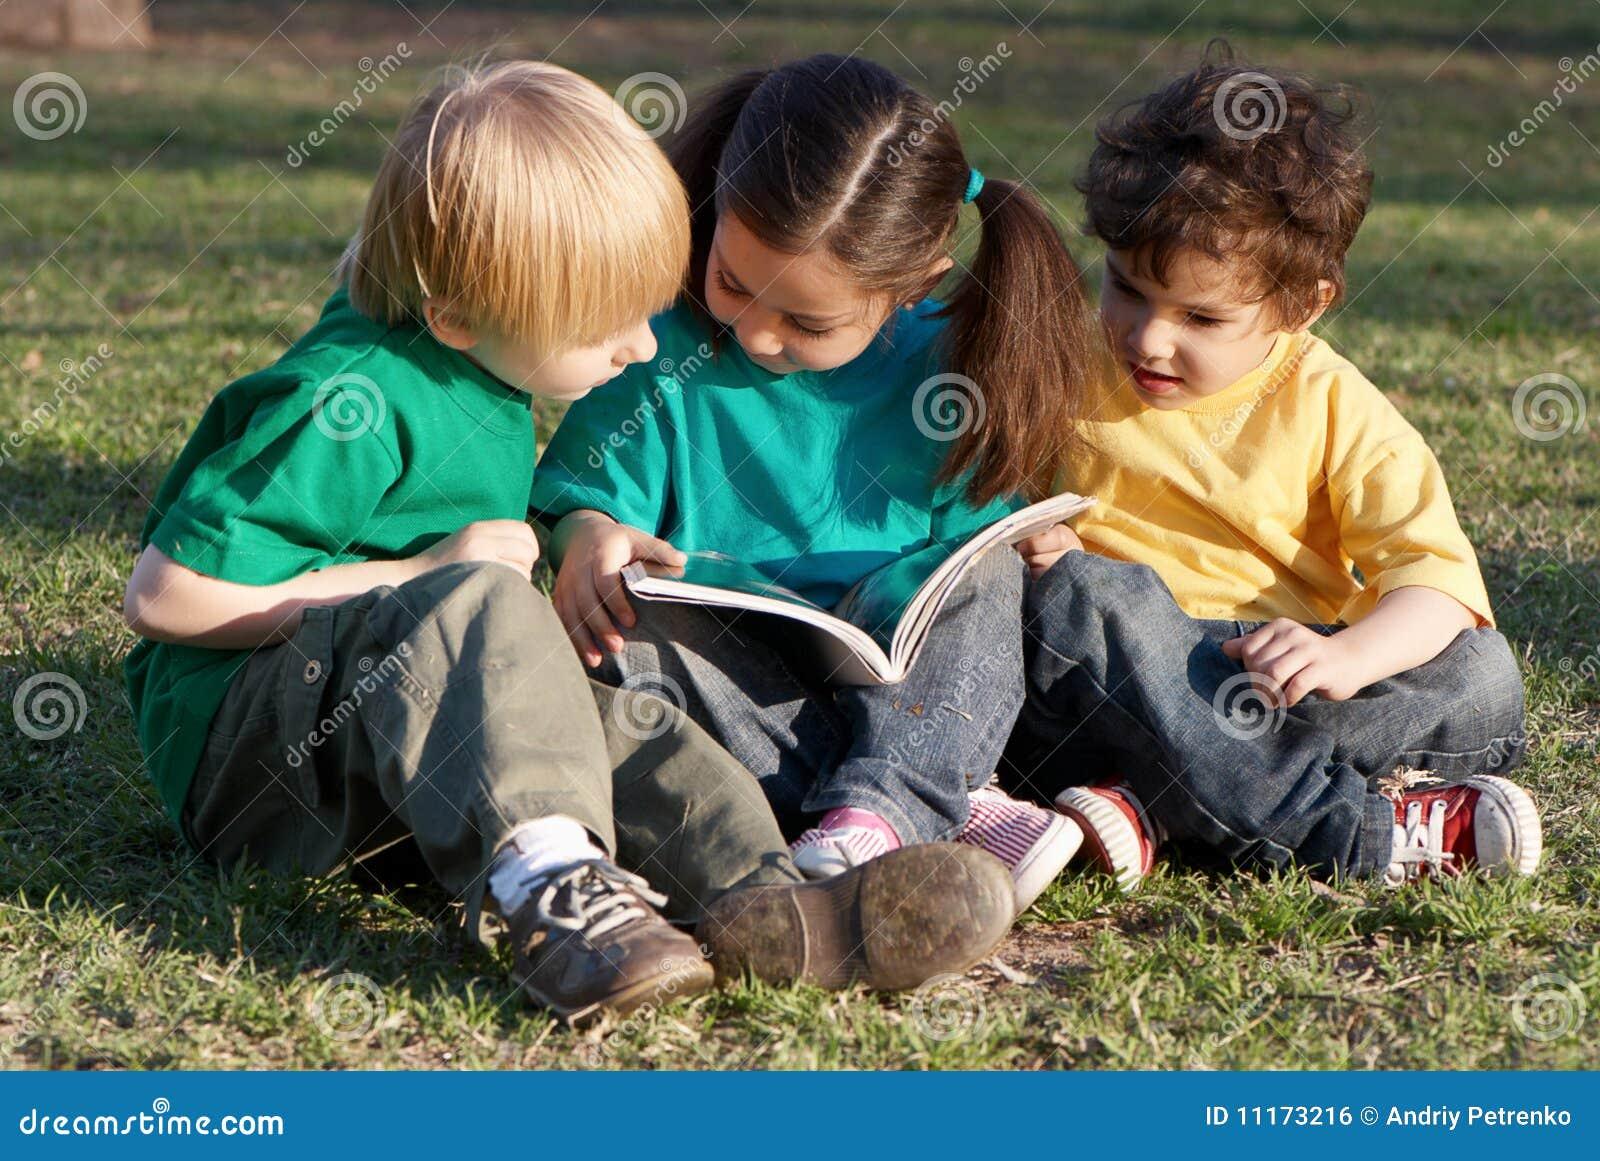 groupe d 39 enfants avec le livre photo stock image 11173216. Black Bedroom Furniture Sets. Home Design Ideas